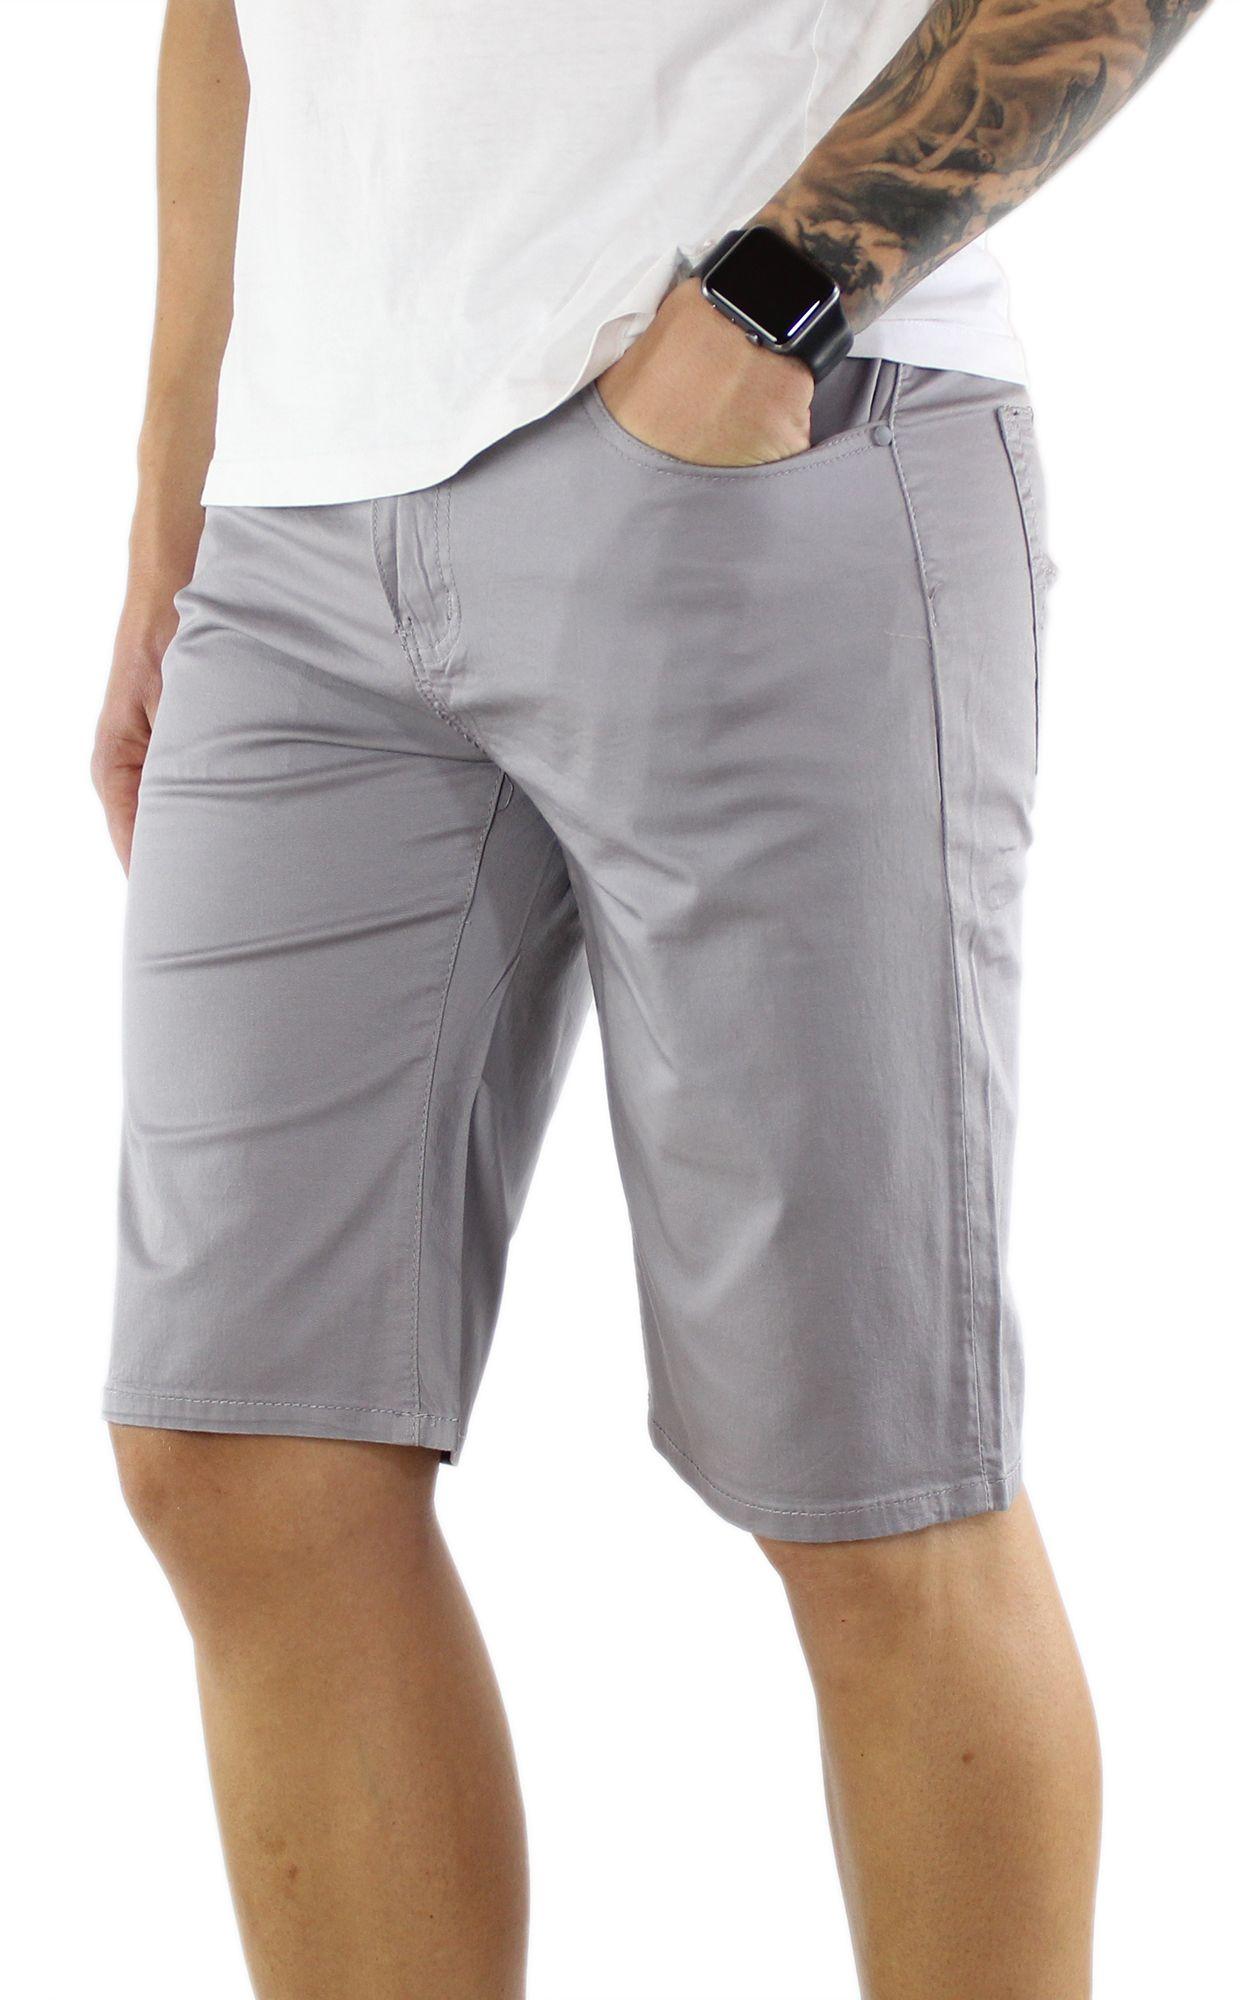 Bermuda-Uomo-Cotone-Slim-Fit-Pantalone-Corto-Shorts-Pantaloncini-Casual miniatuur 6